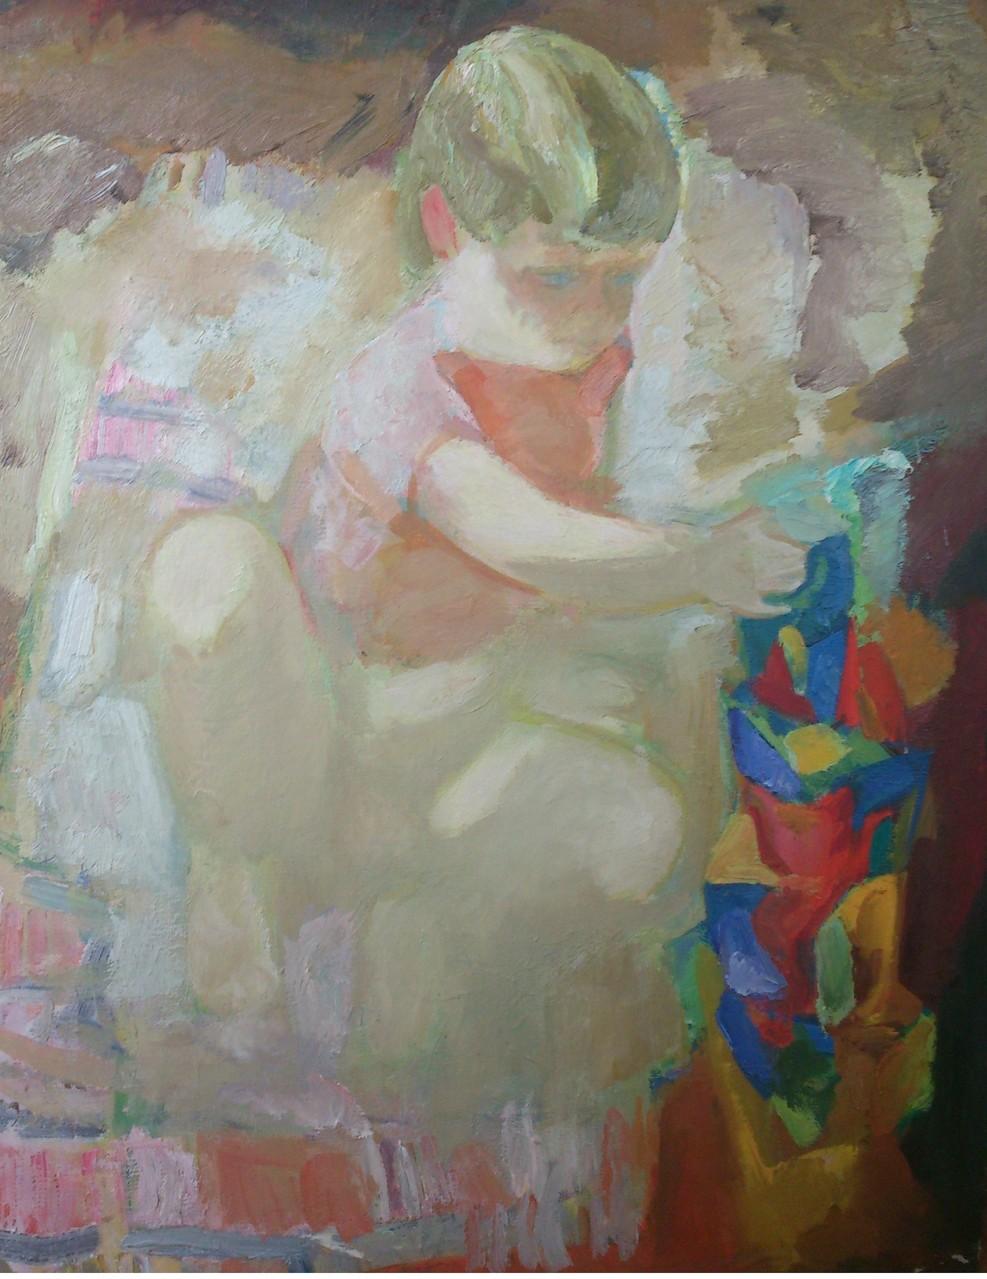 Виктор Меркулов (1936-2010).      Солнечный зайчик.     Холст, масло.      89х79 см.